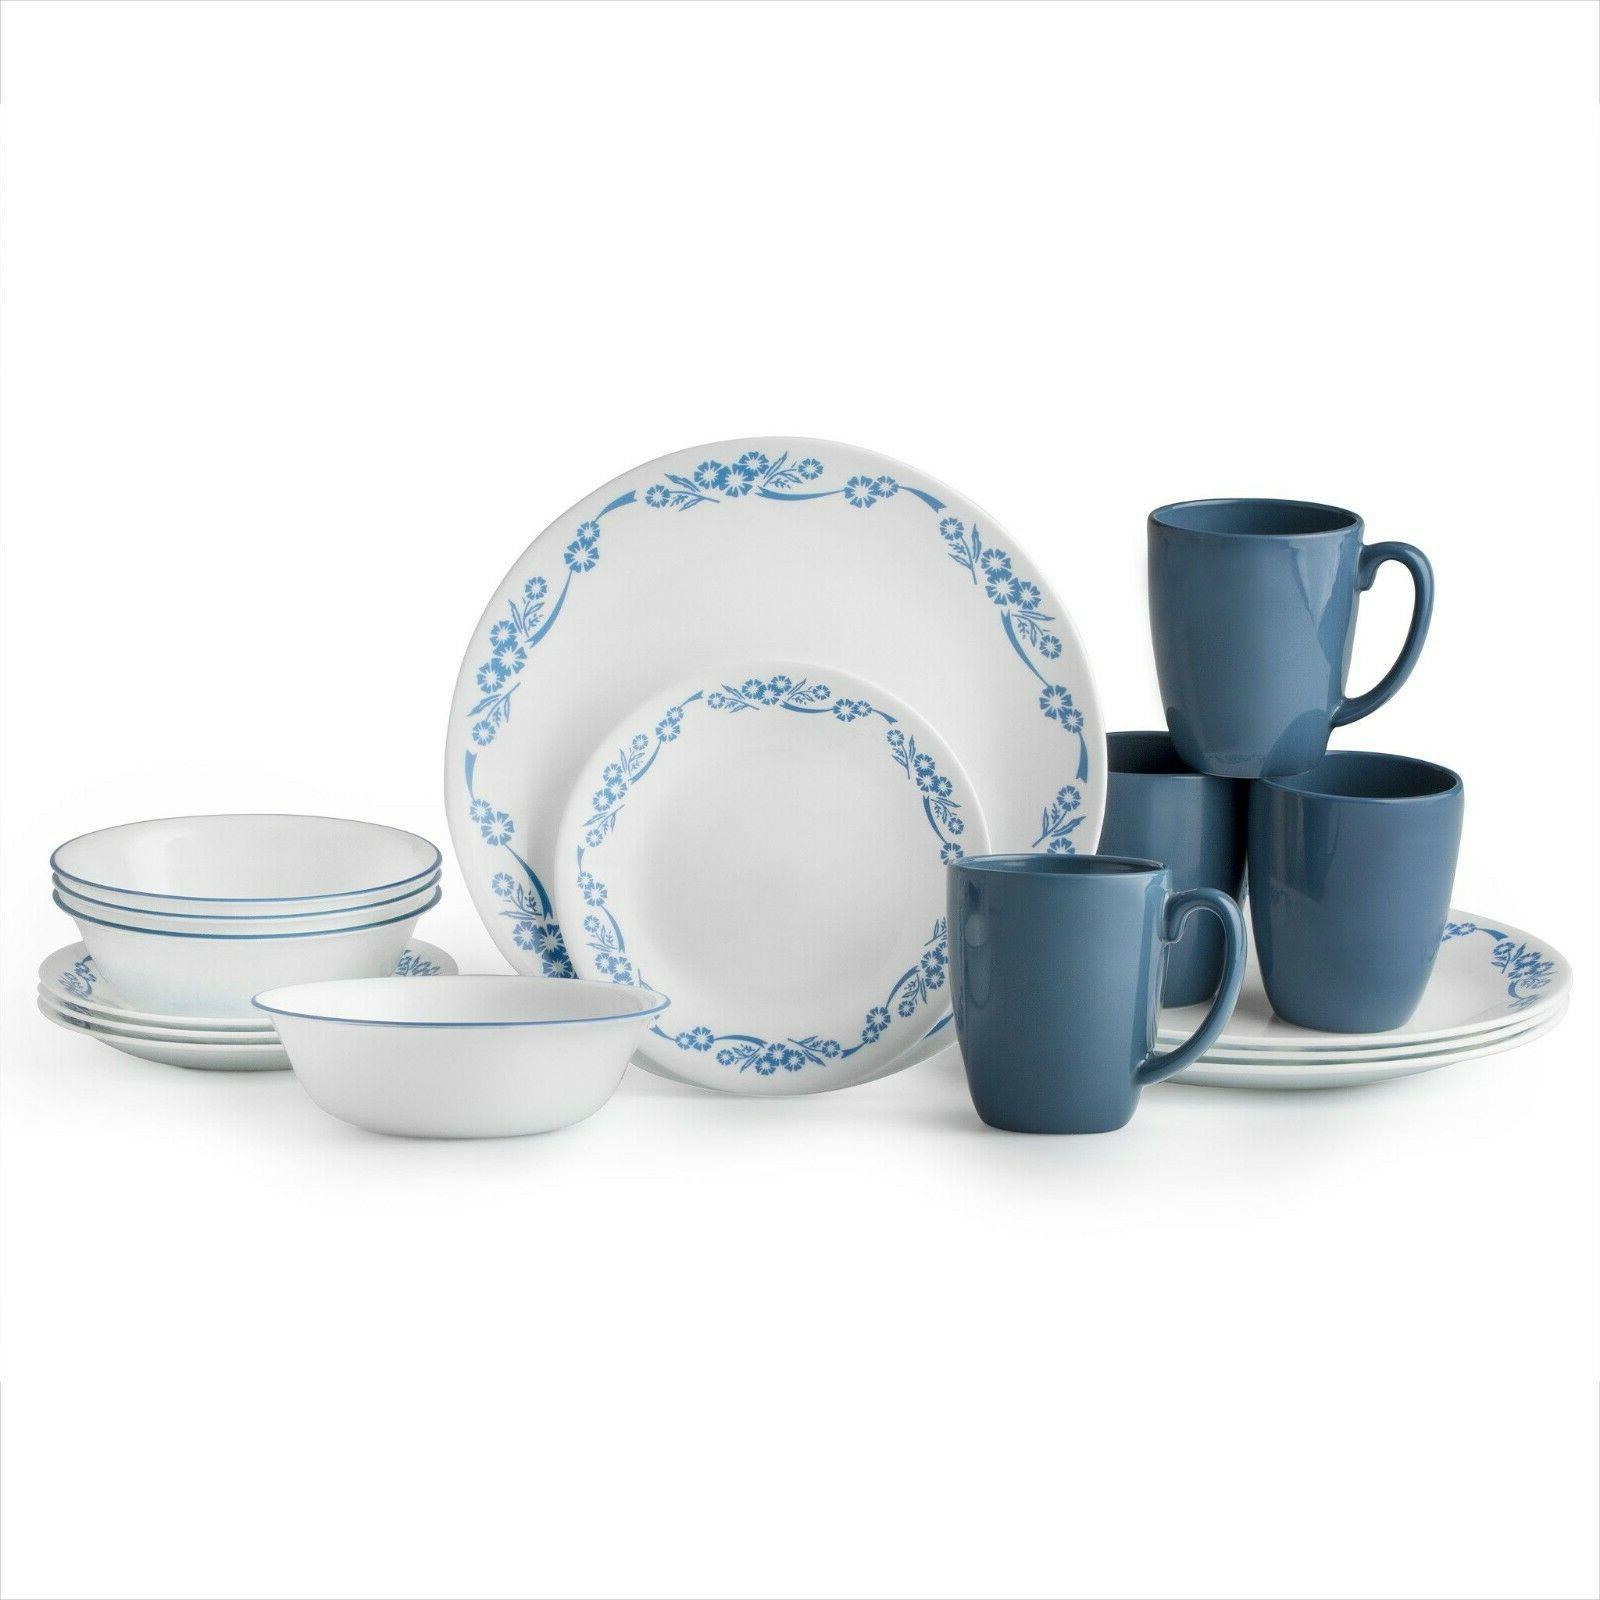 livingware cornflower 16 piece dinnerware set stoneware